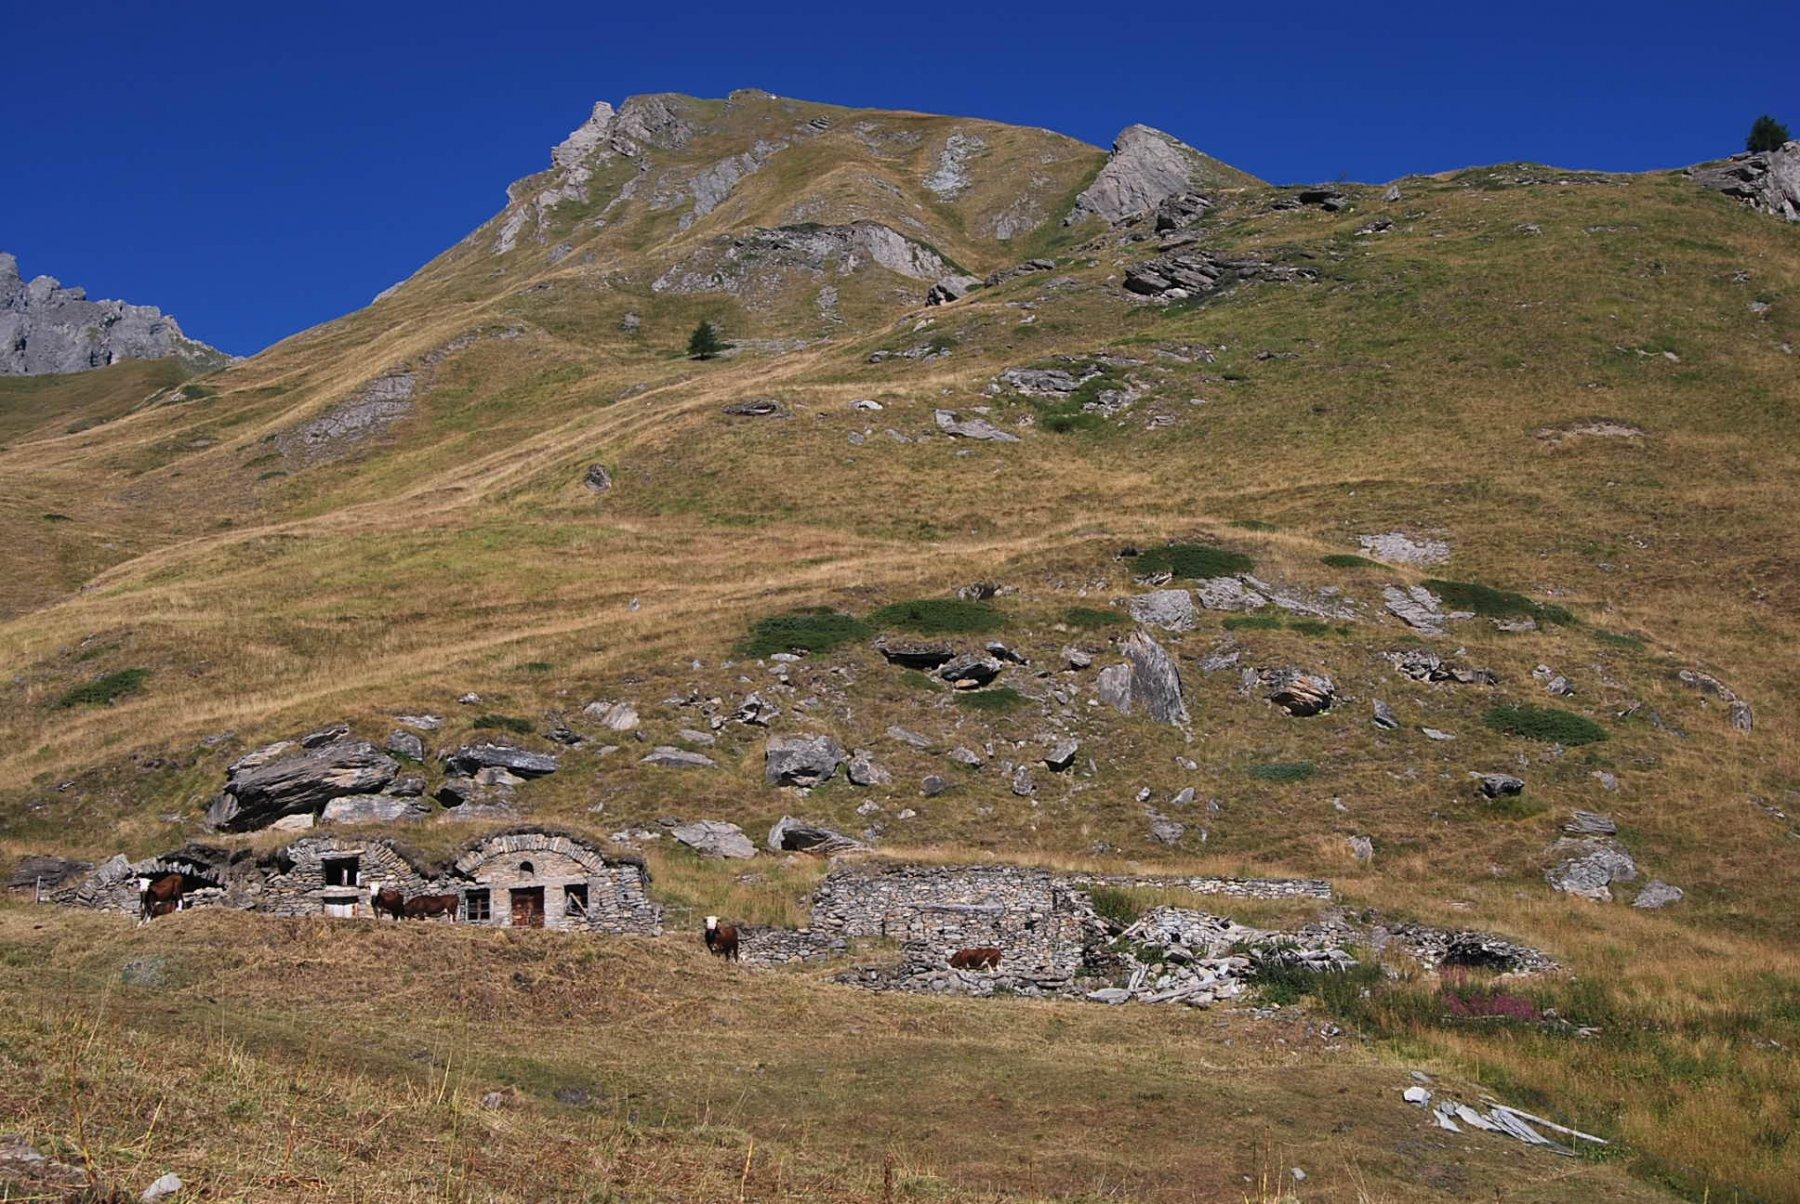 Crevacol (Testa di) da Planaval, traversata a Pra Farcoz per i colli Serena, Ceingles, Saint Rhemy 2016-08-27